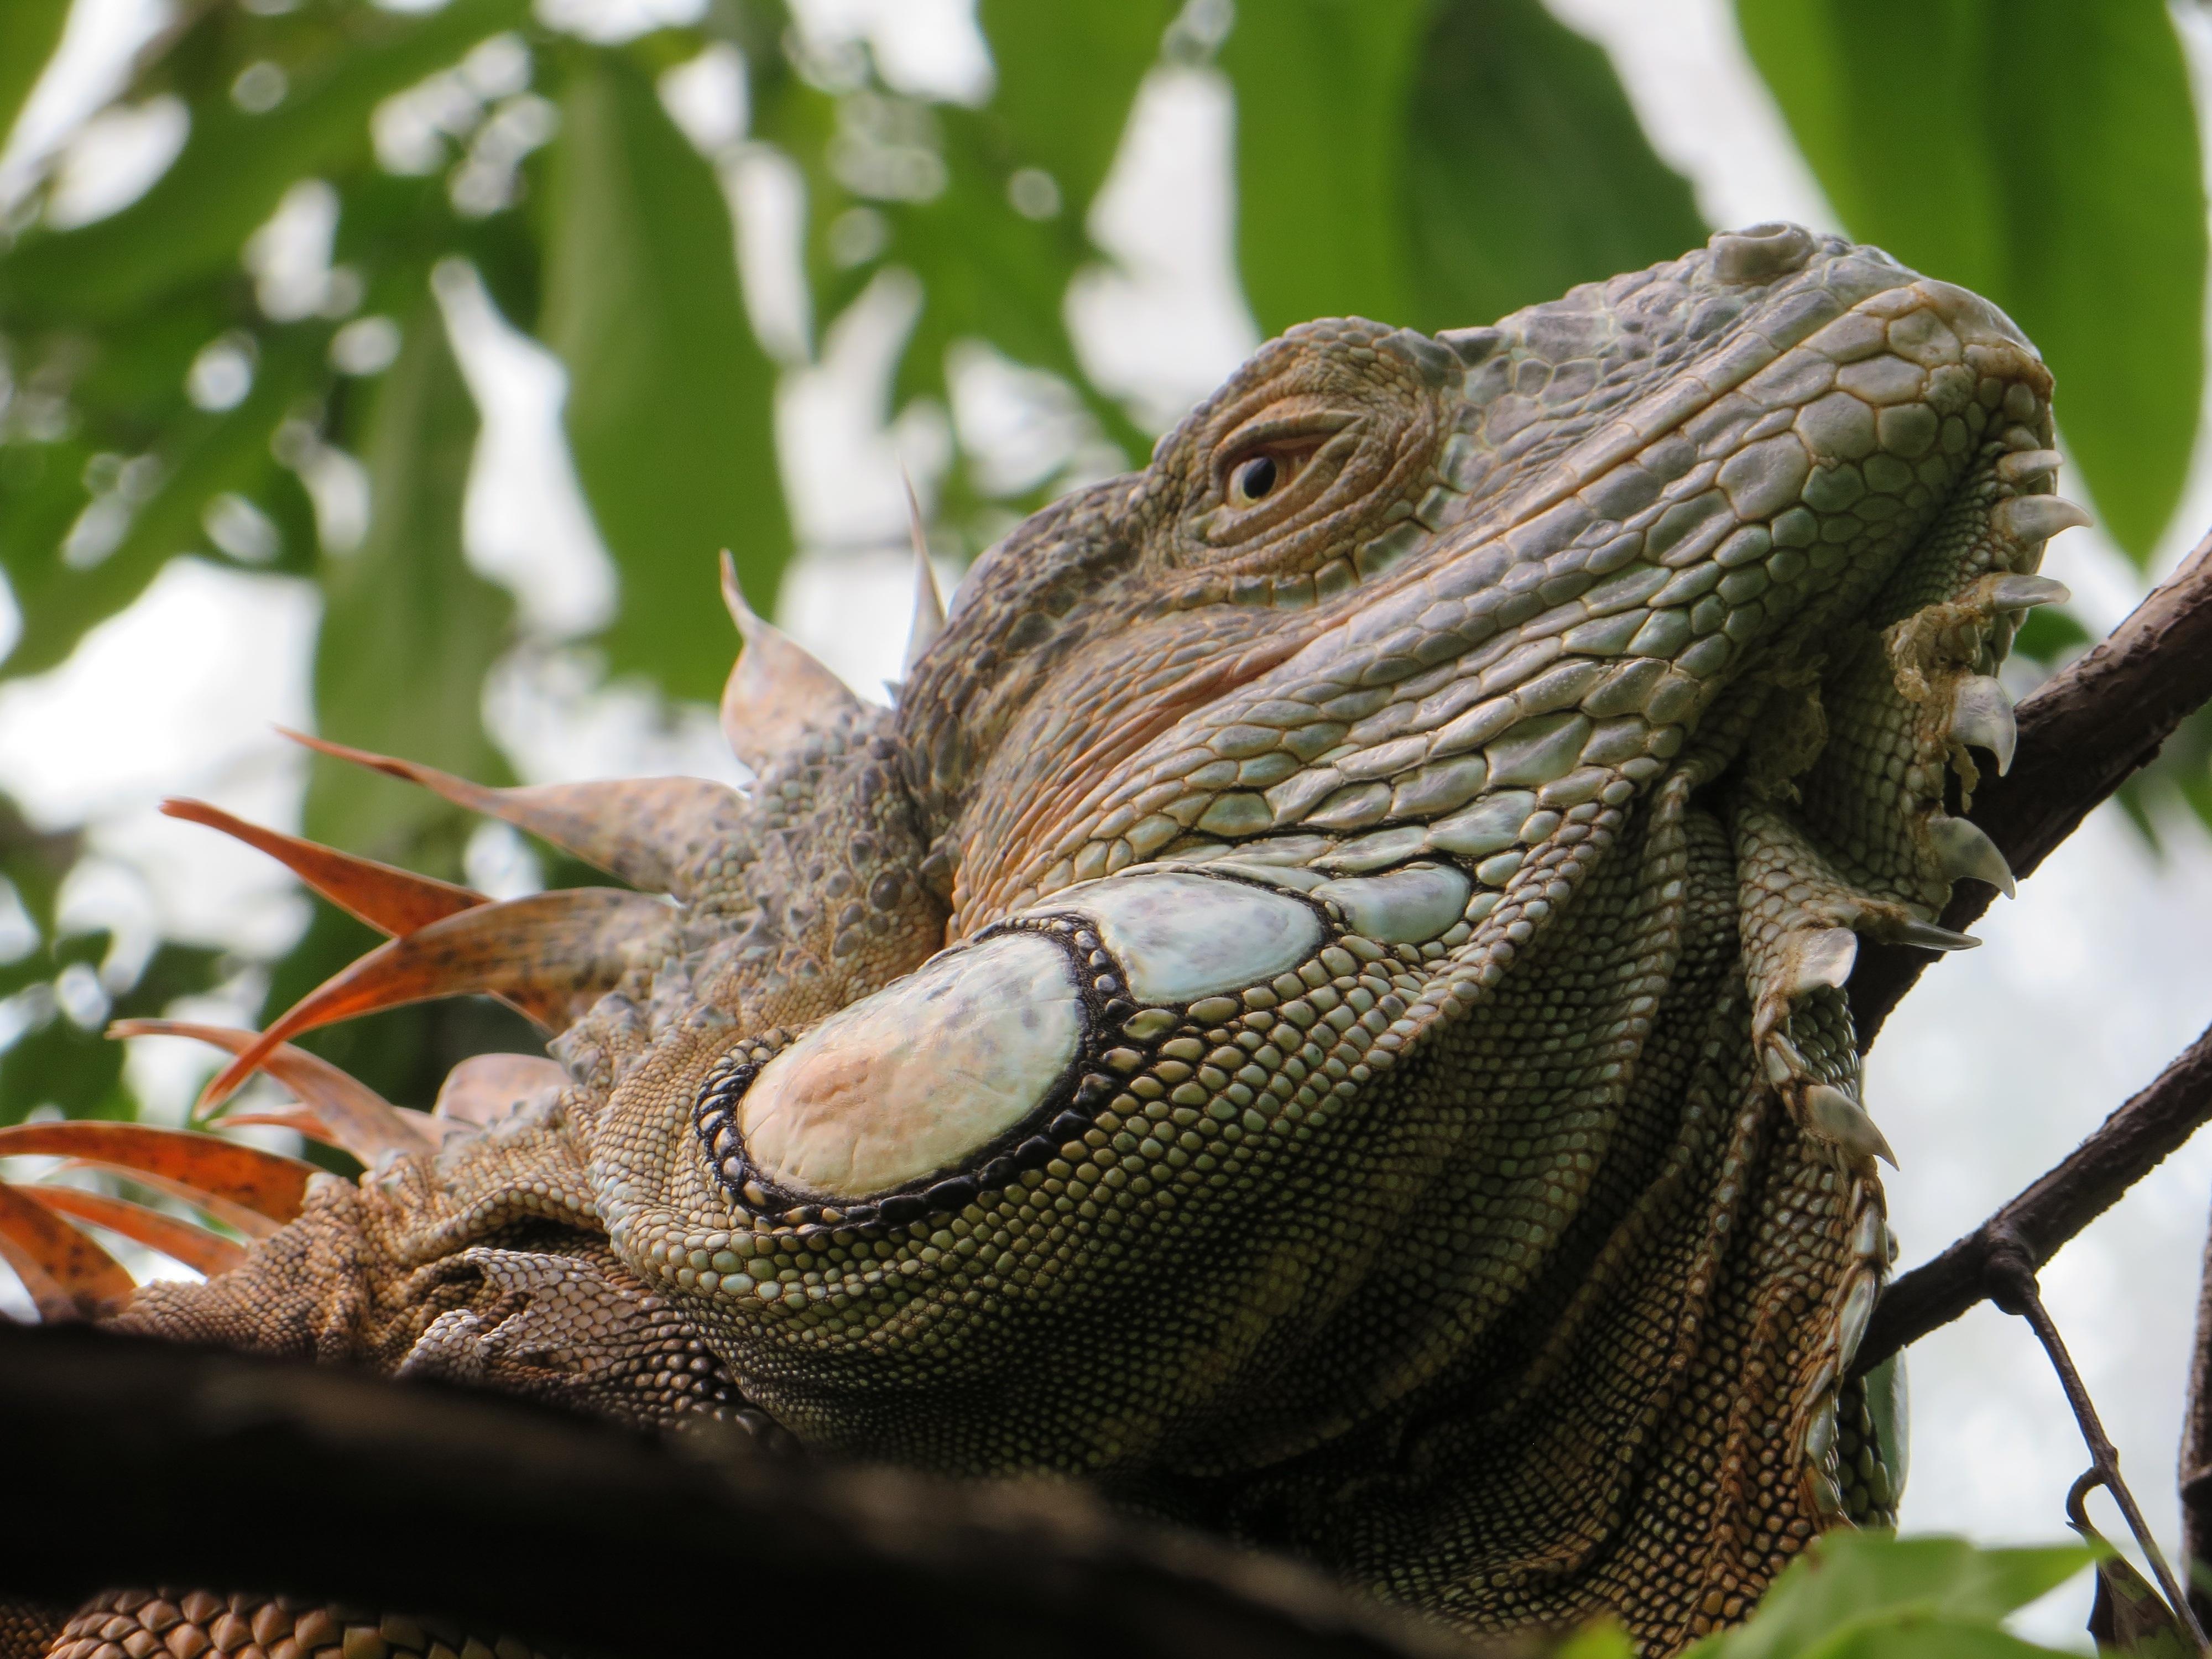 Wild Iguana, Animal, Green, Iguana, Lizard, HQ Photo